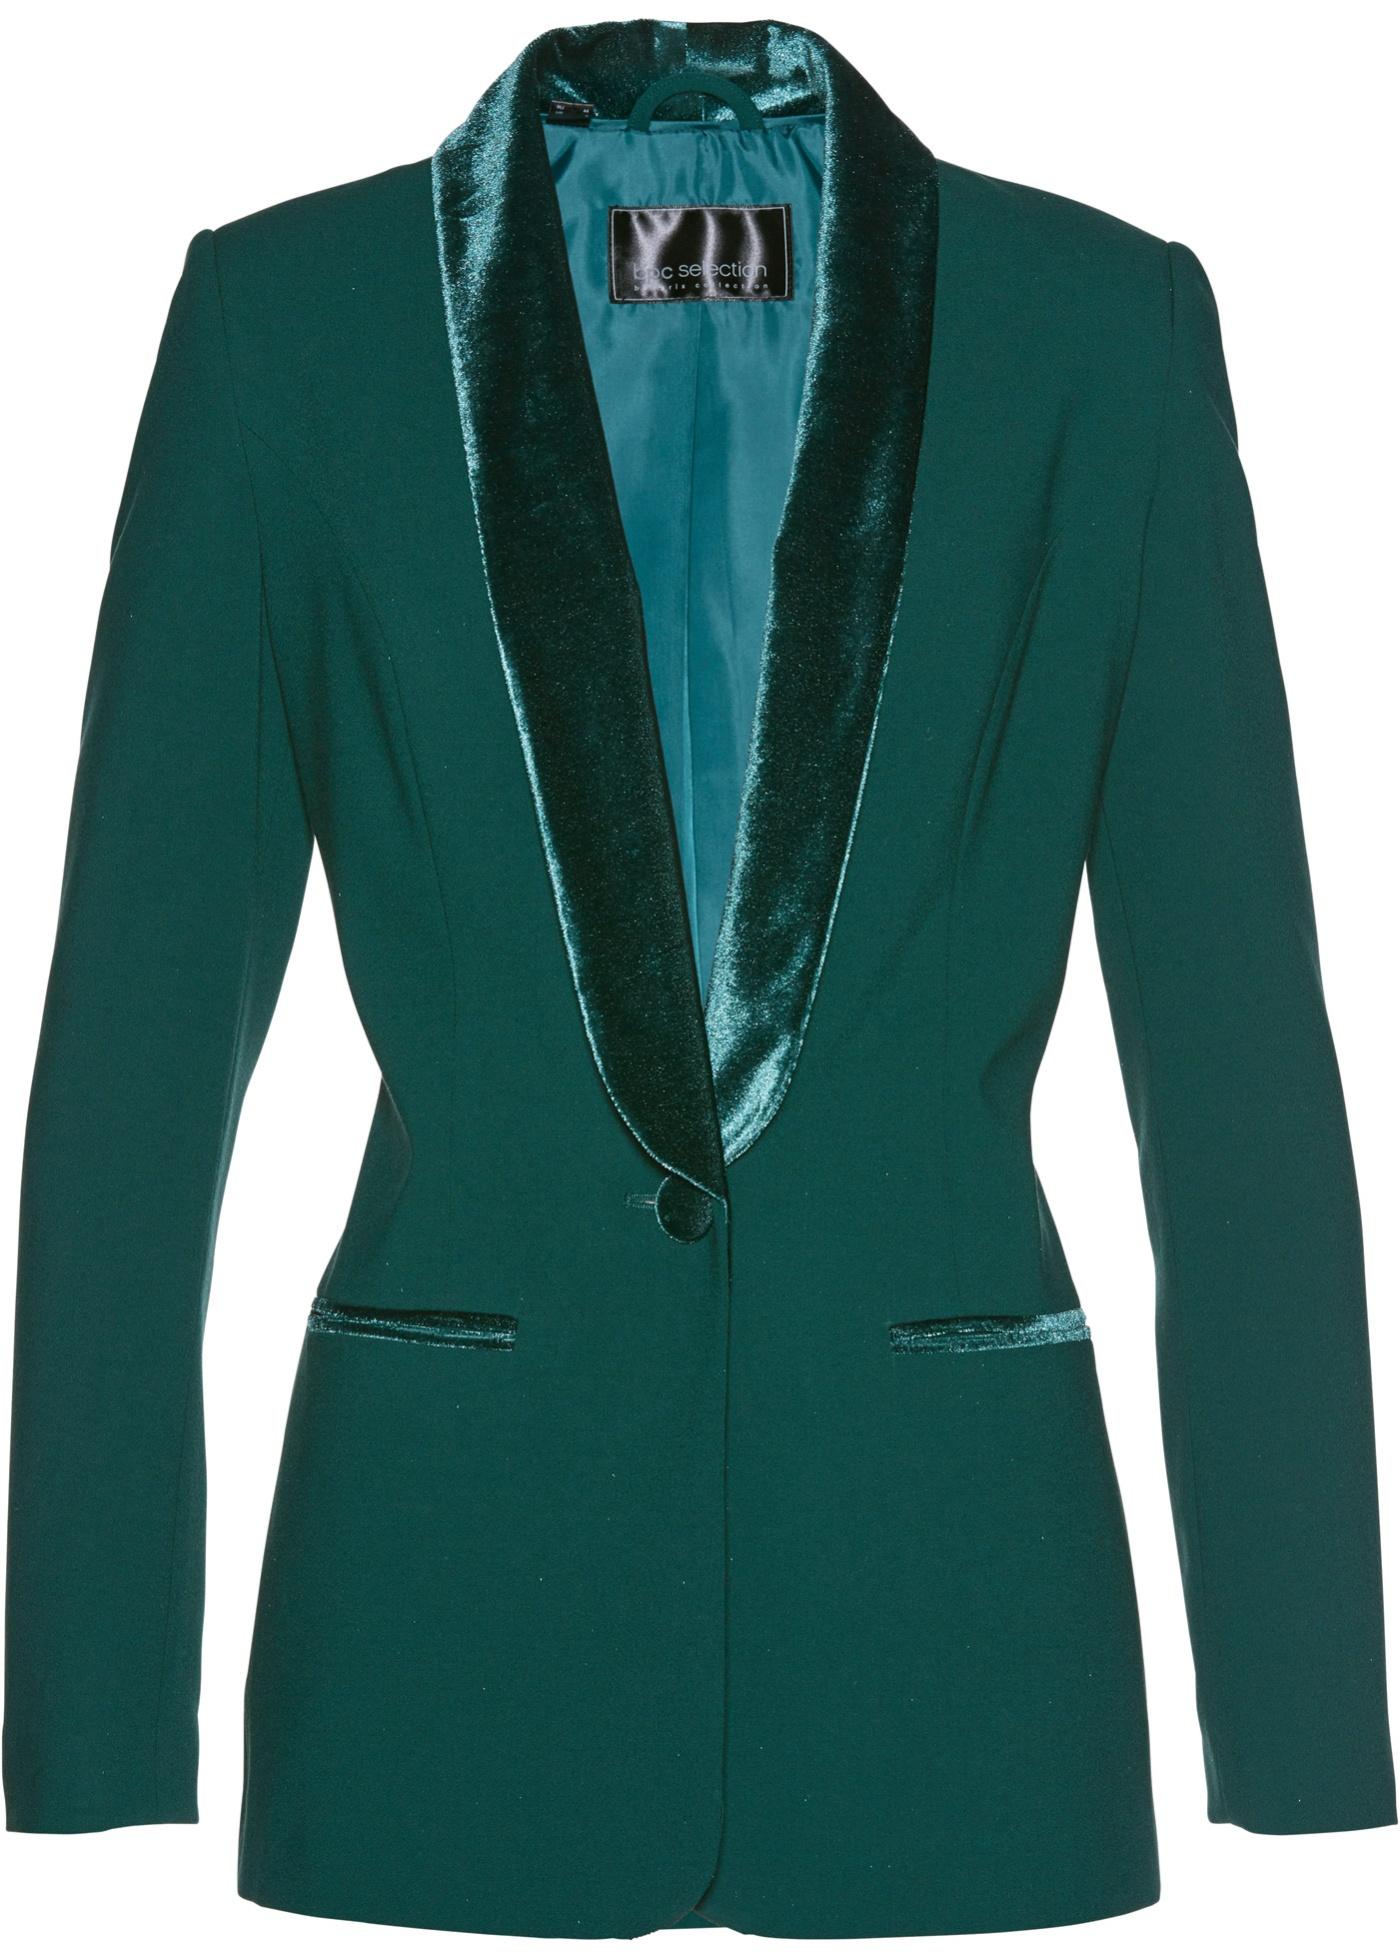 Blazer con revers in velluto (Verde) - bpc selection